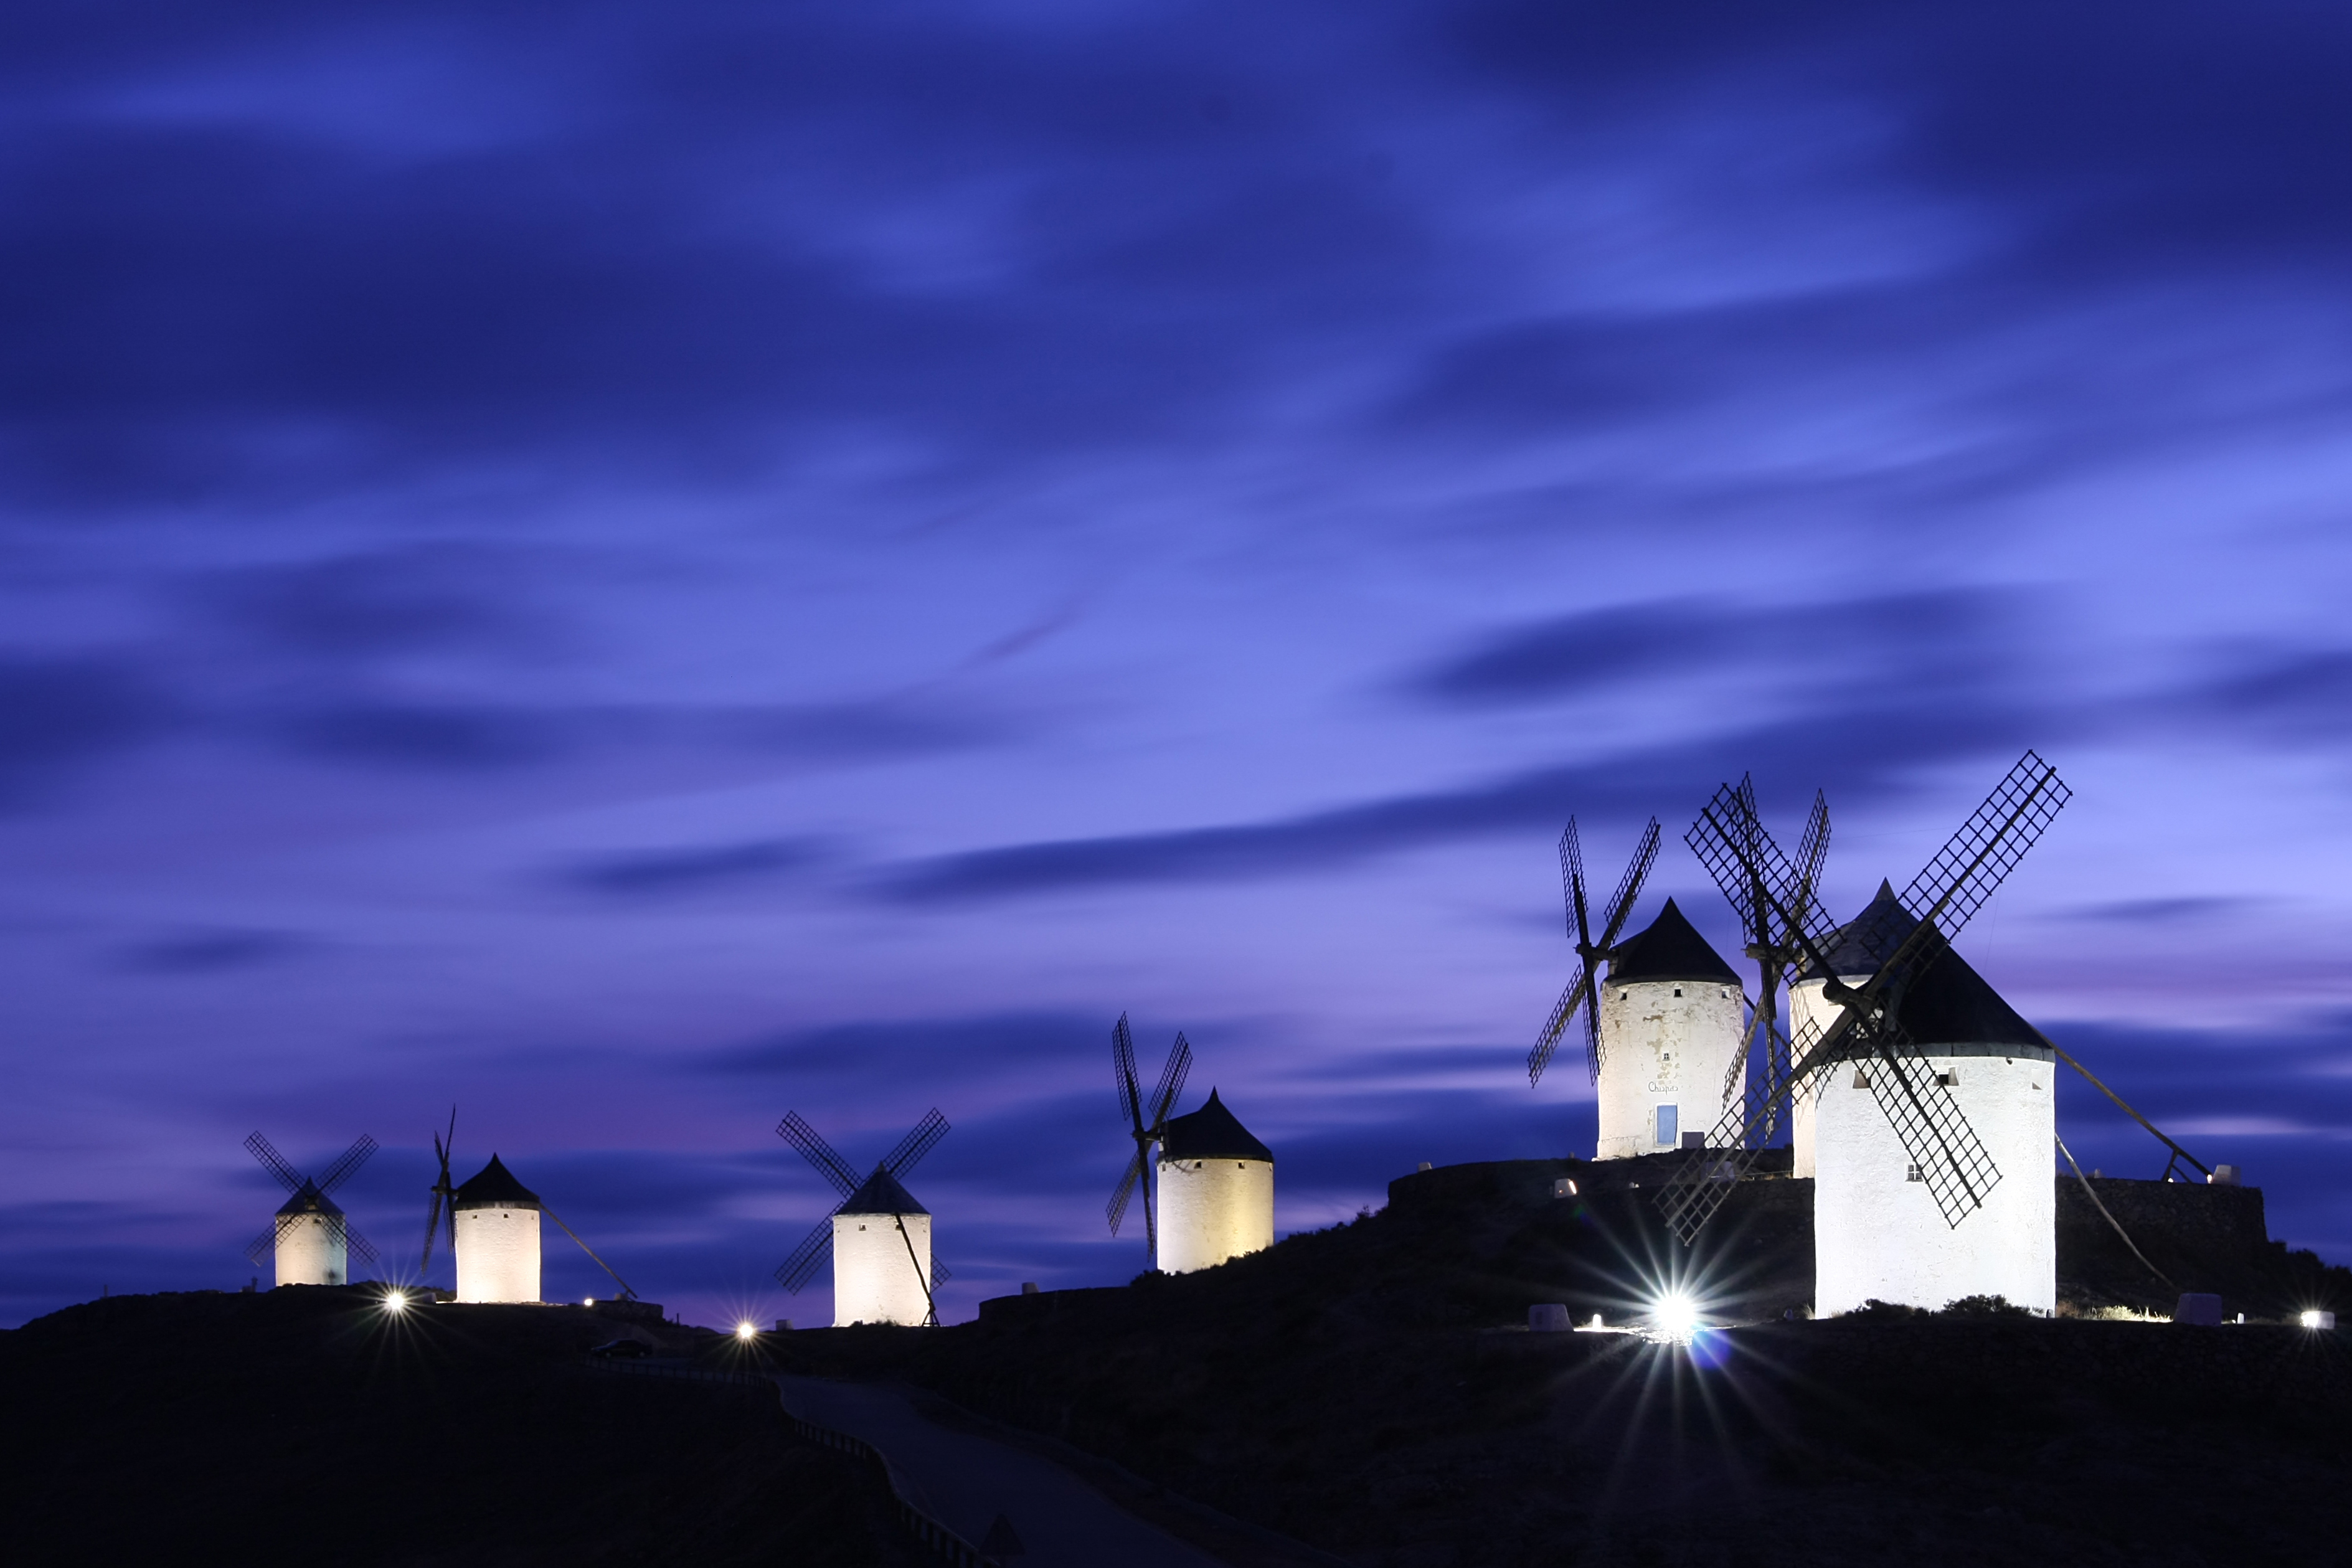 Molinos La Mancha - Hugo Díaz-Regañón